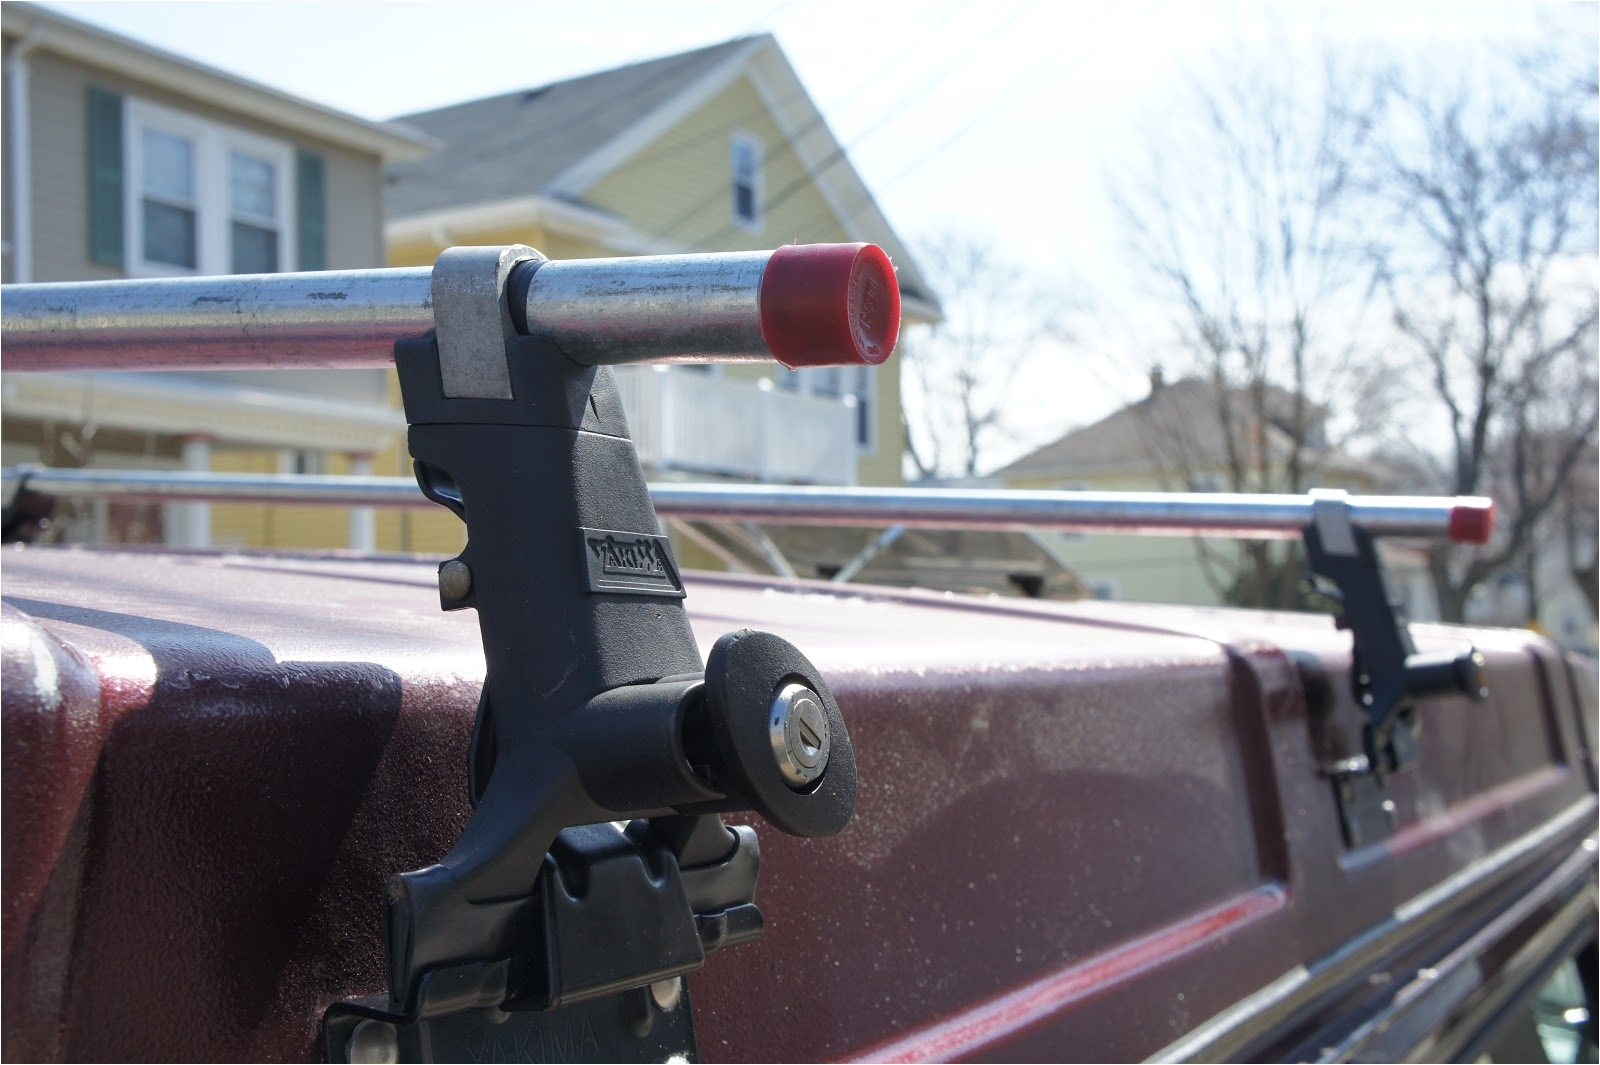 Yakima Kayak Racks for Trucks Vanagon Travels Vw Vanagon Road Trip and Photo Blog Vanagon